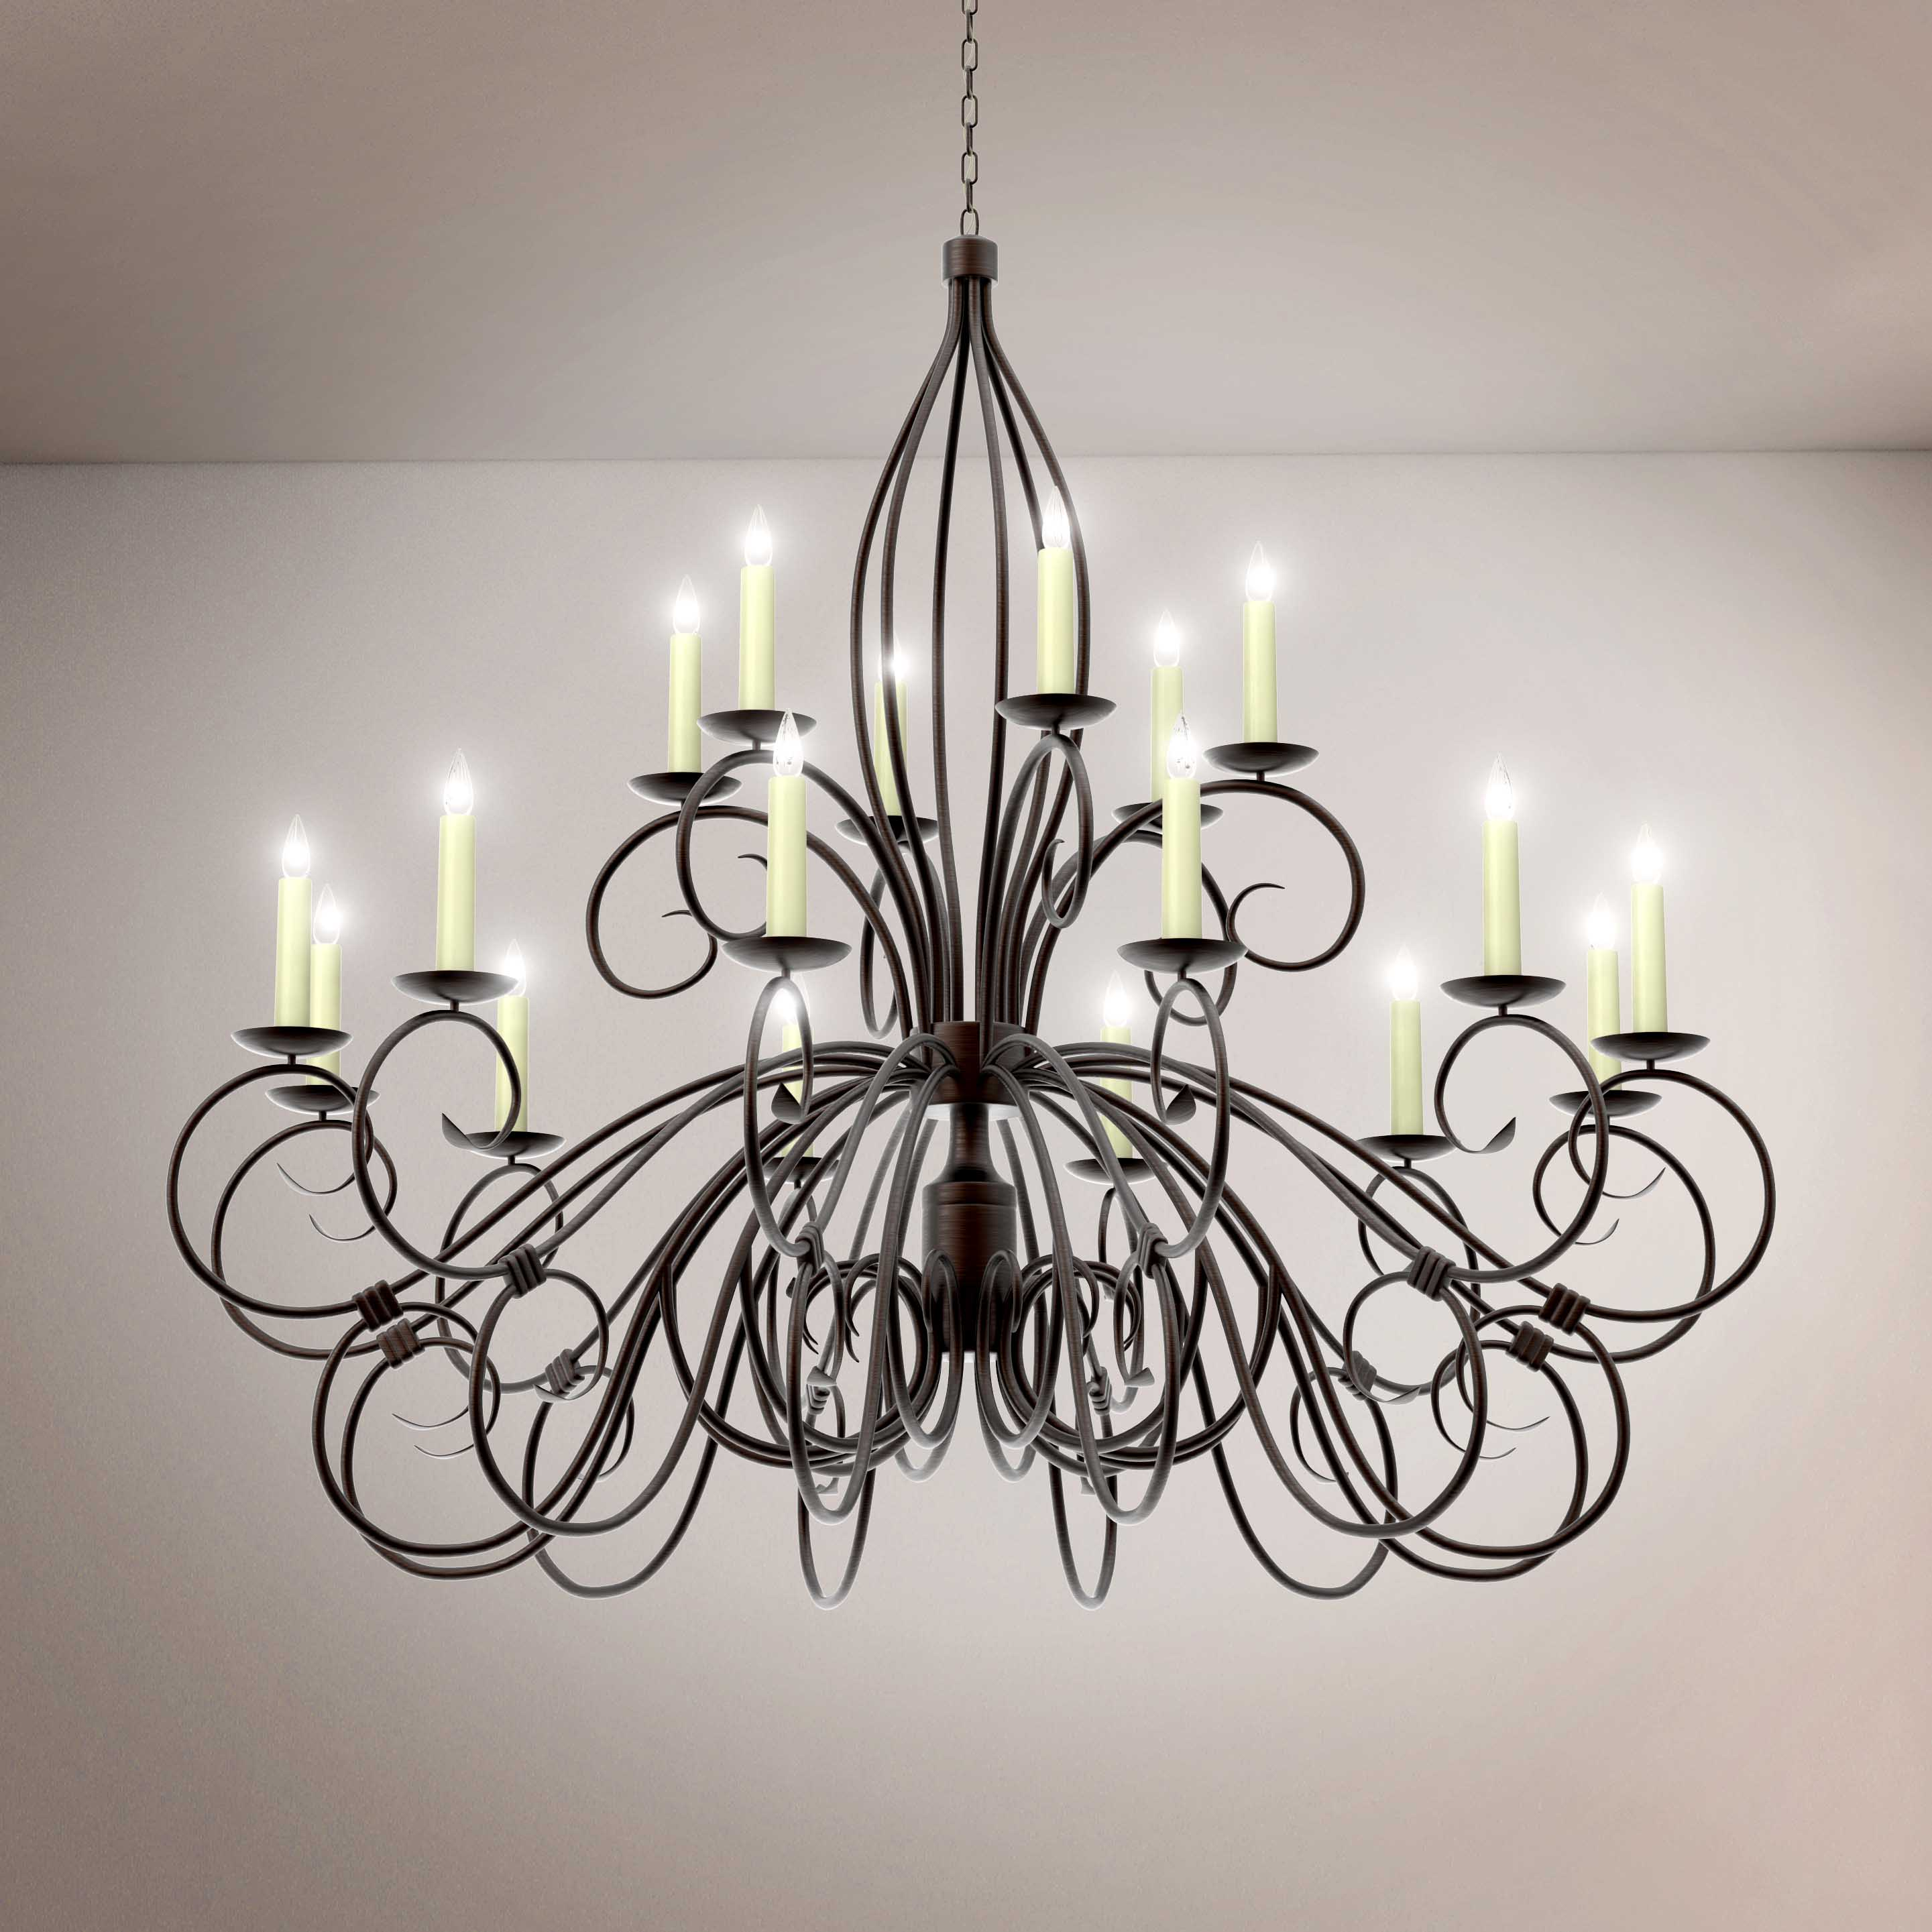 Elegant Luxury Vintage Crystal Chandelier - 3D Product